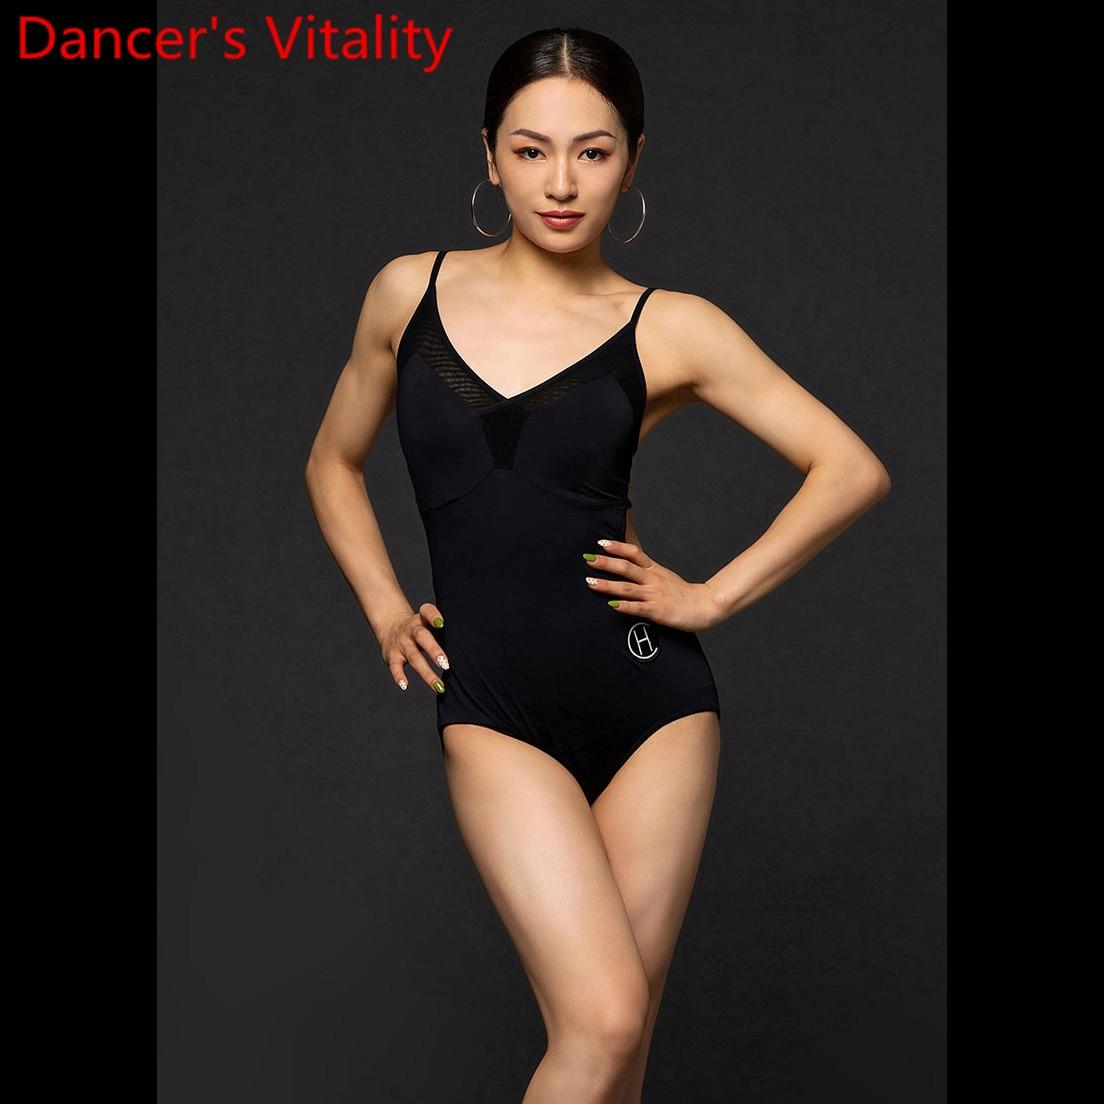 Latin Dance Performance Clothes Women Adults Backless Body Suit With Chest Paddings Rumba Samba Tango Cha Cha Dancing Train Top